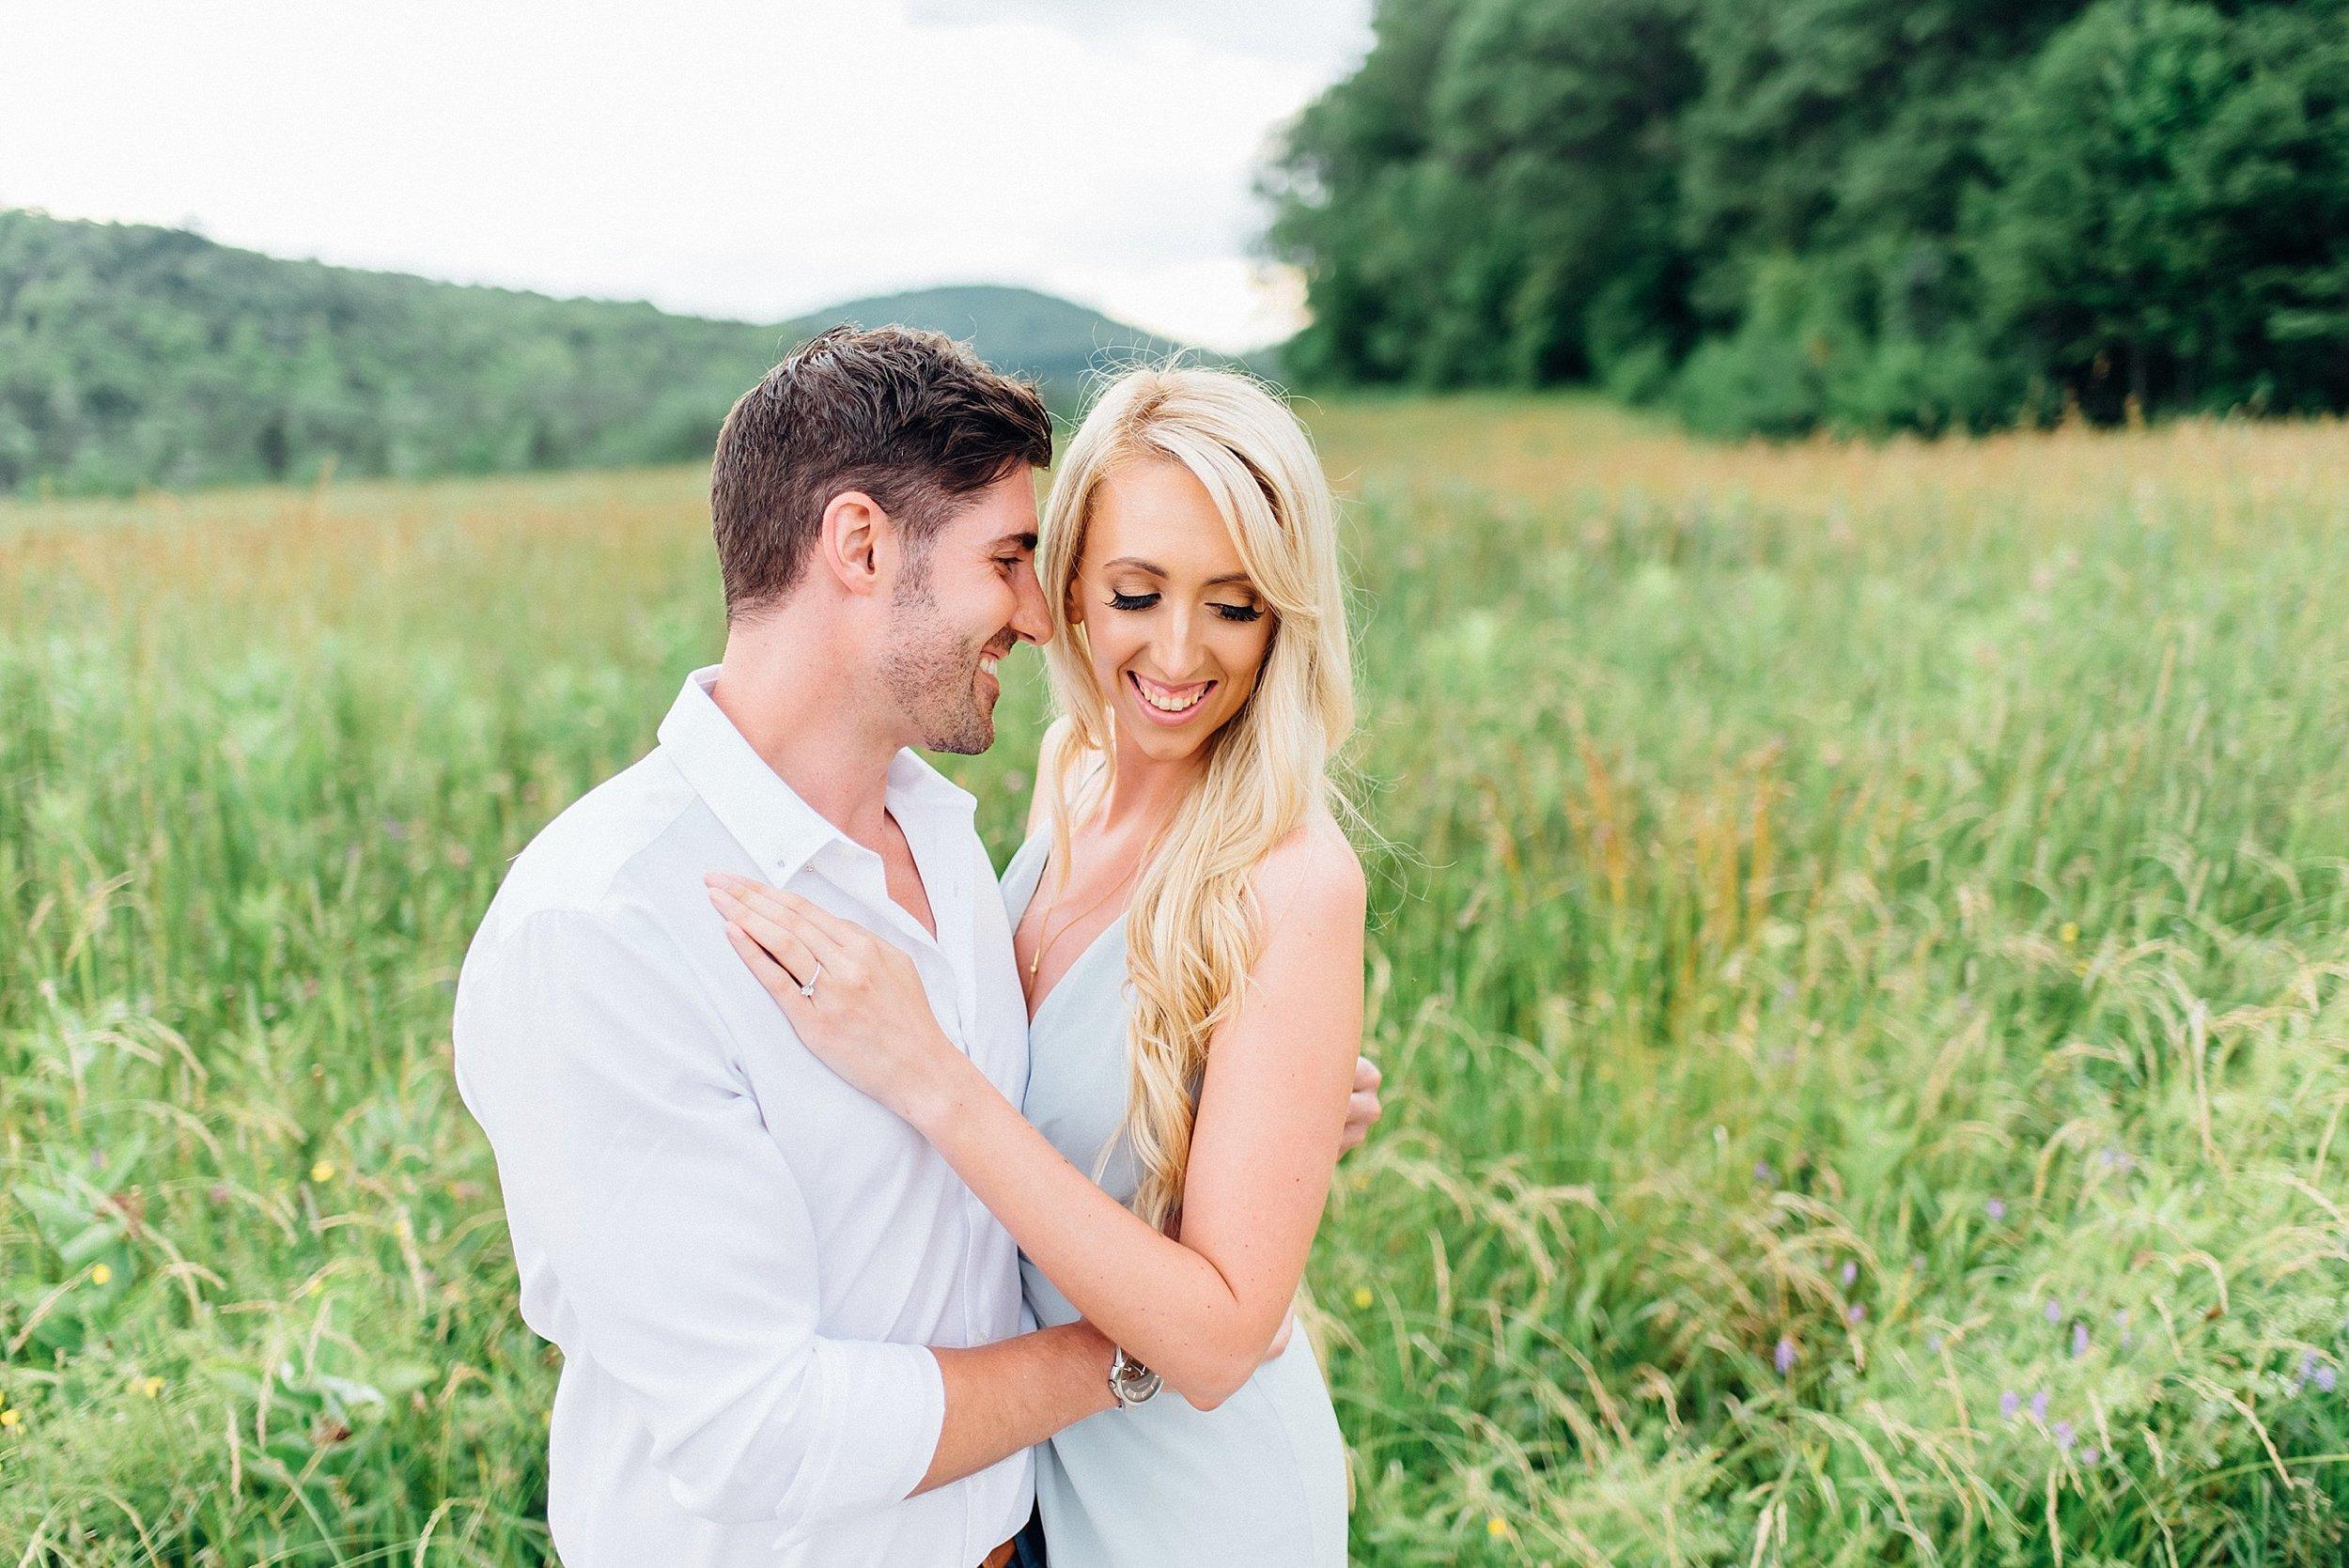 Ali and Batoul Photography - light, airy, indie documentary Ottawa wedding photographer_0024.jpg